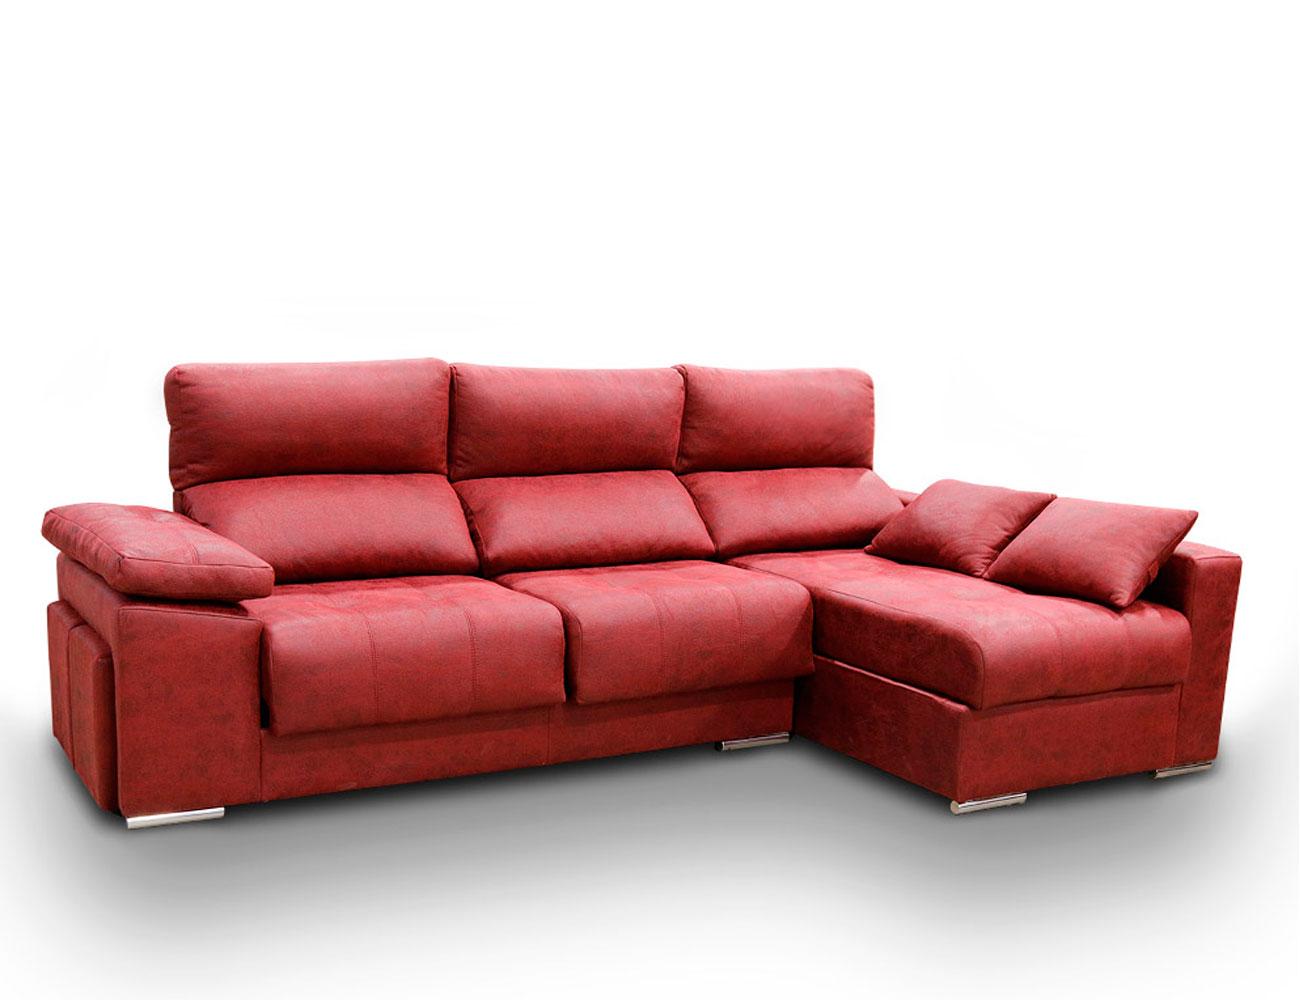 Sofa chaiselongue anti manchas rojo granate13